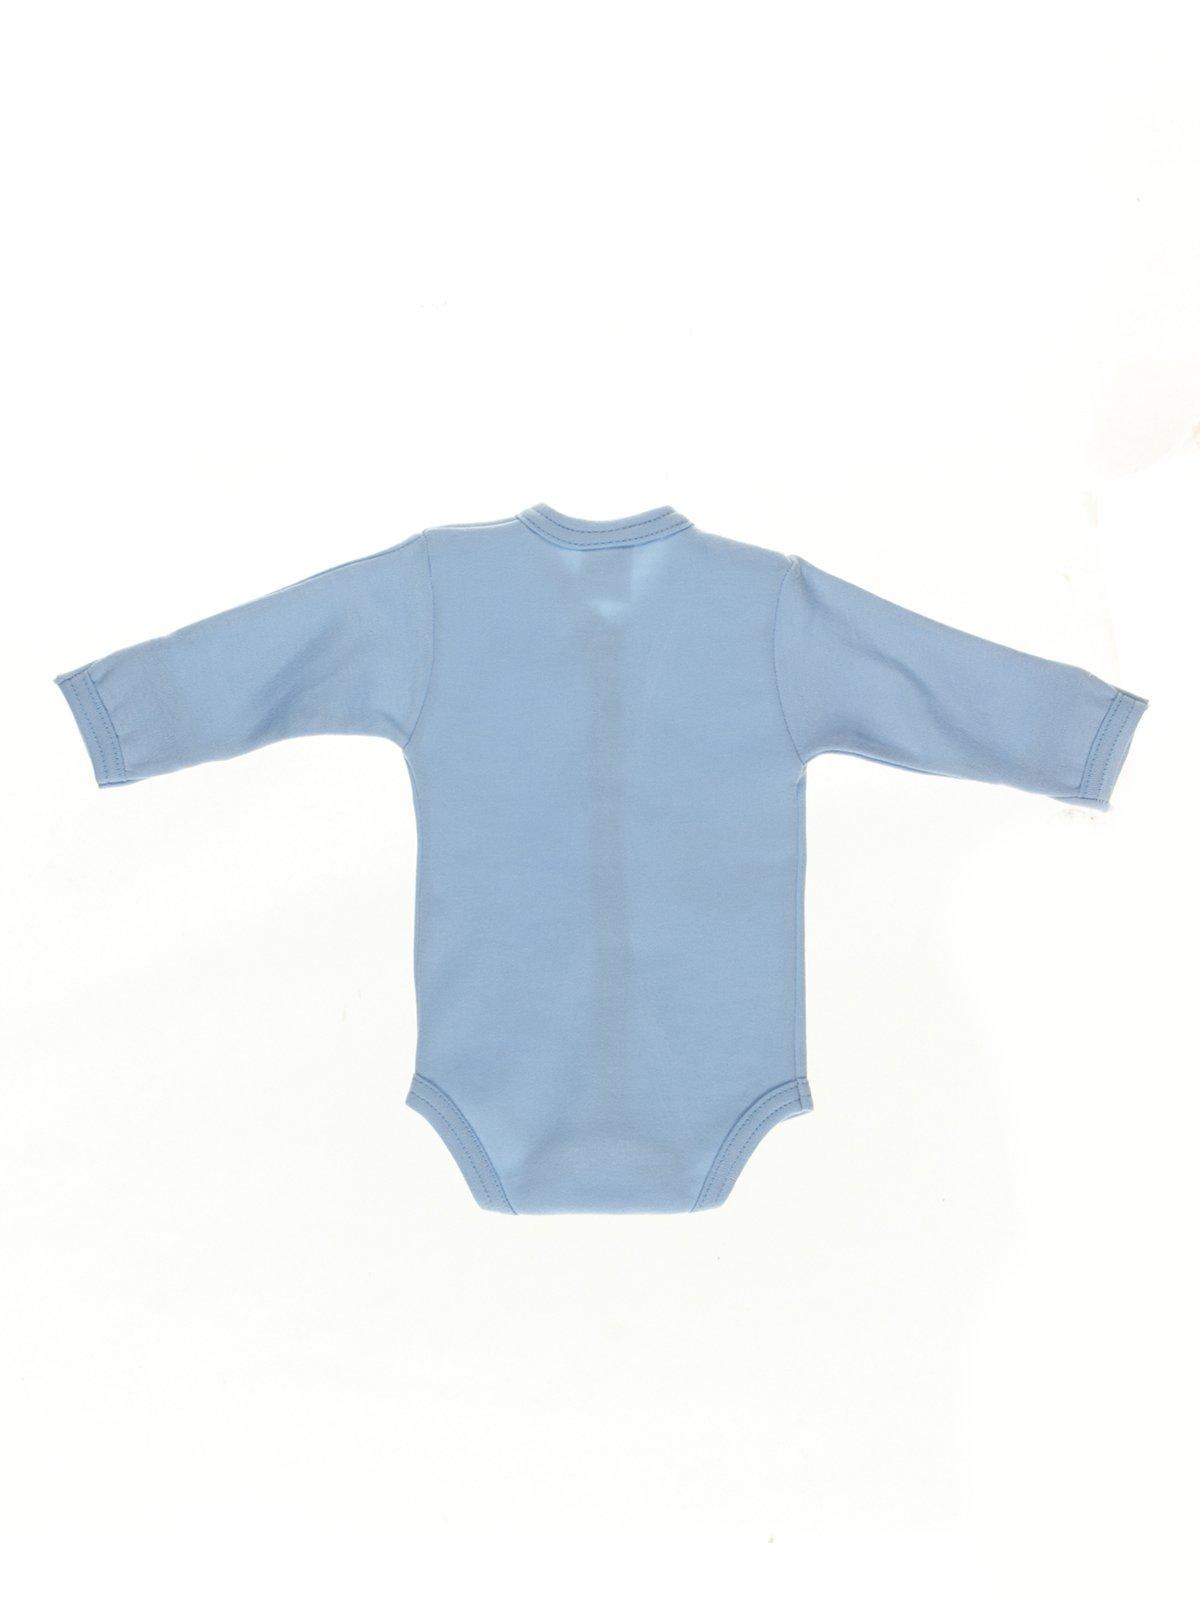 Боди голубое | 2954751 | фото 2